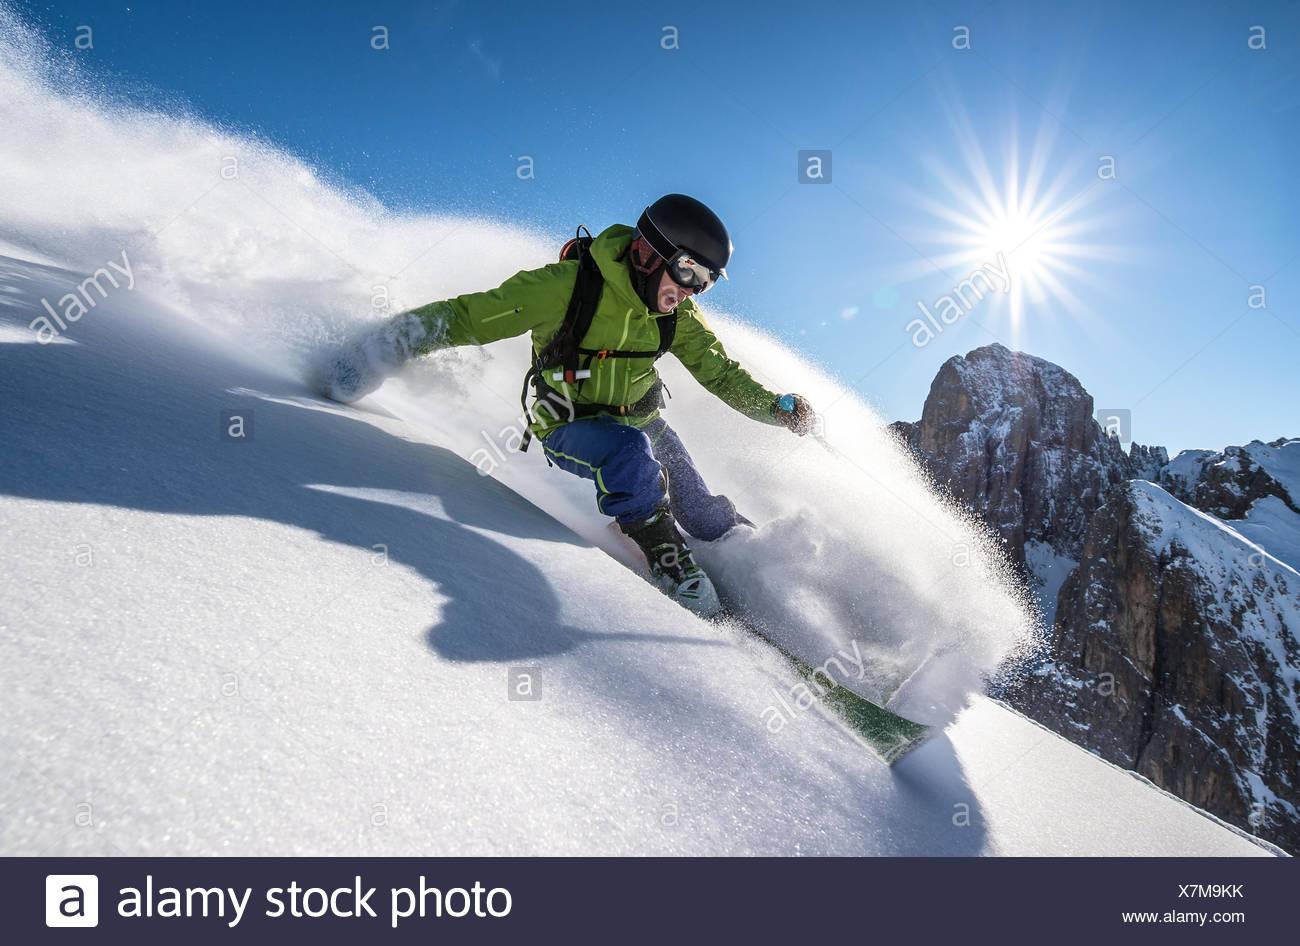 Man skiing off piste, Dolomites, Italy - Stock Image